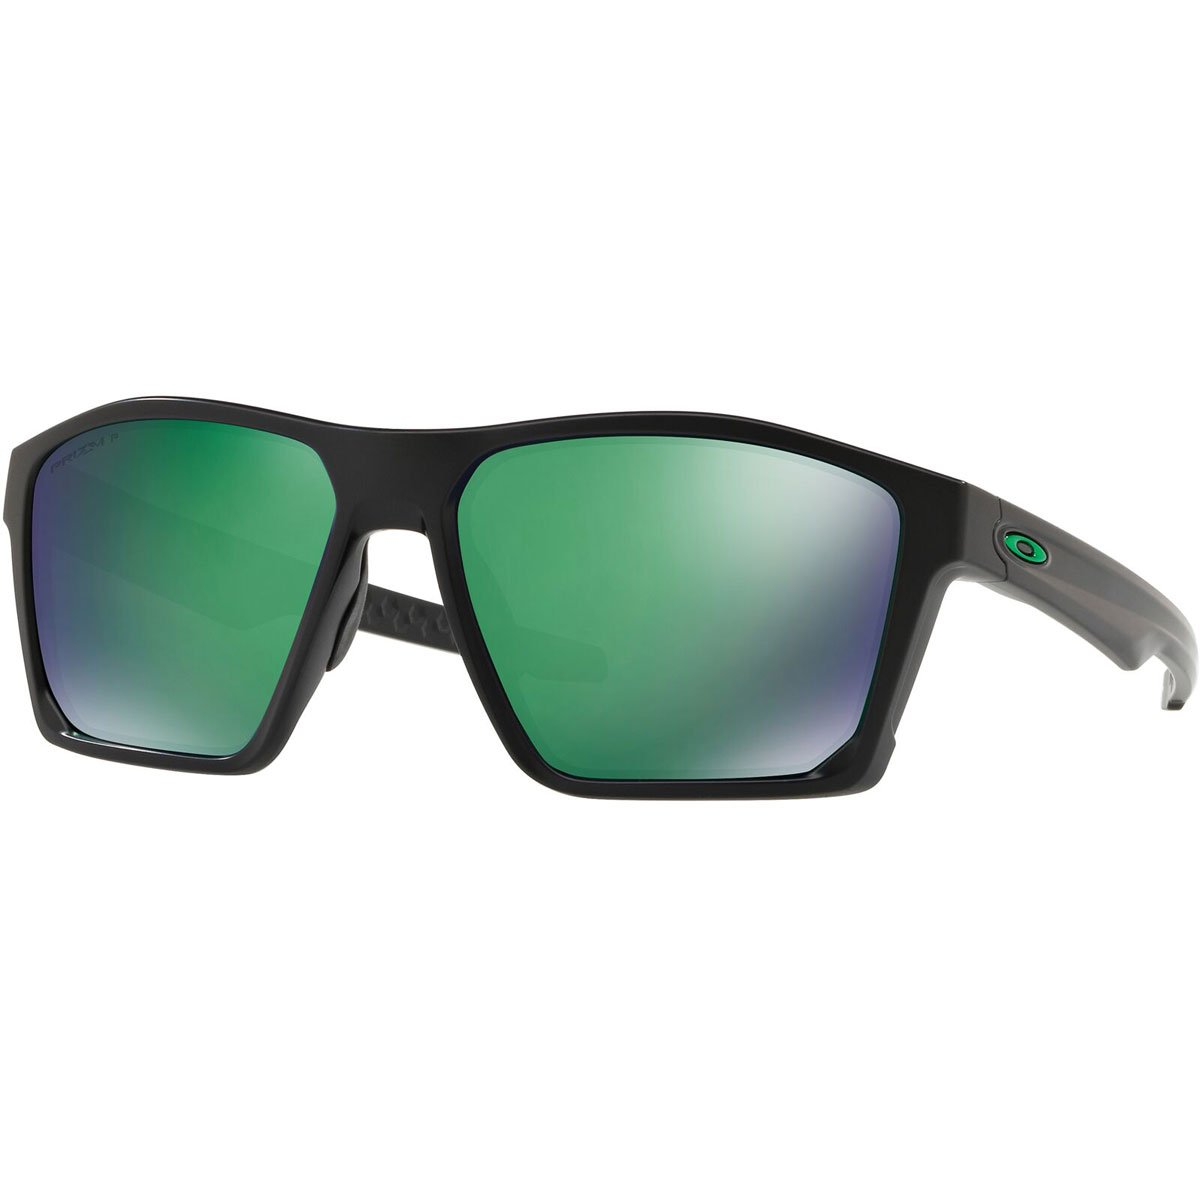 e078fbf14815c Amazon.com  Oakley Men s Targetline Polarized Iridium Square Sunglasses